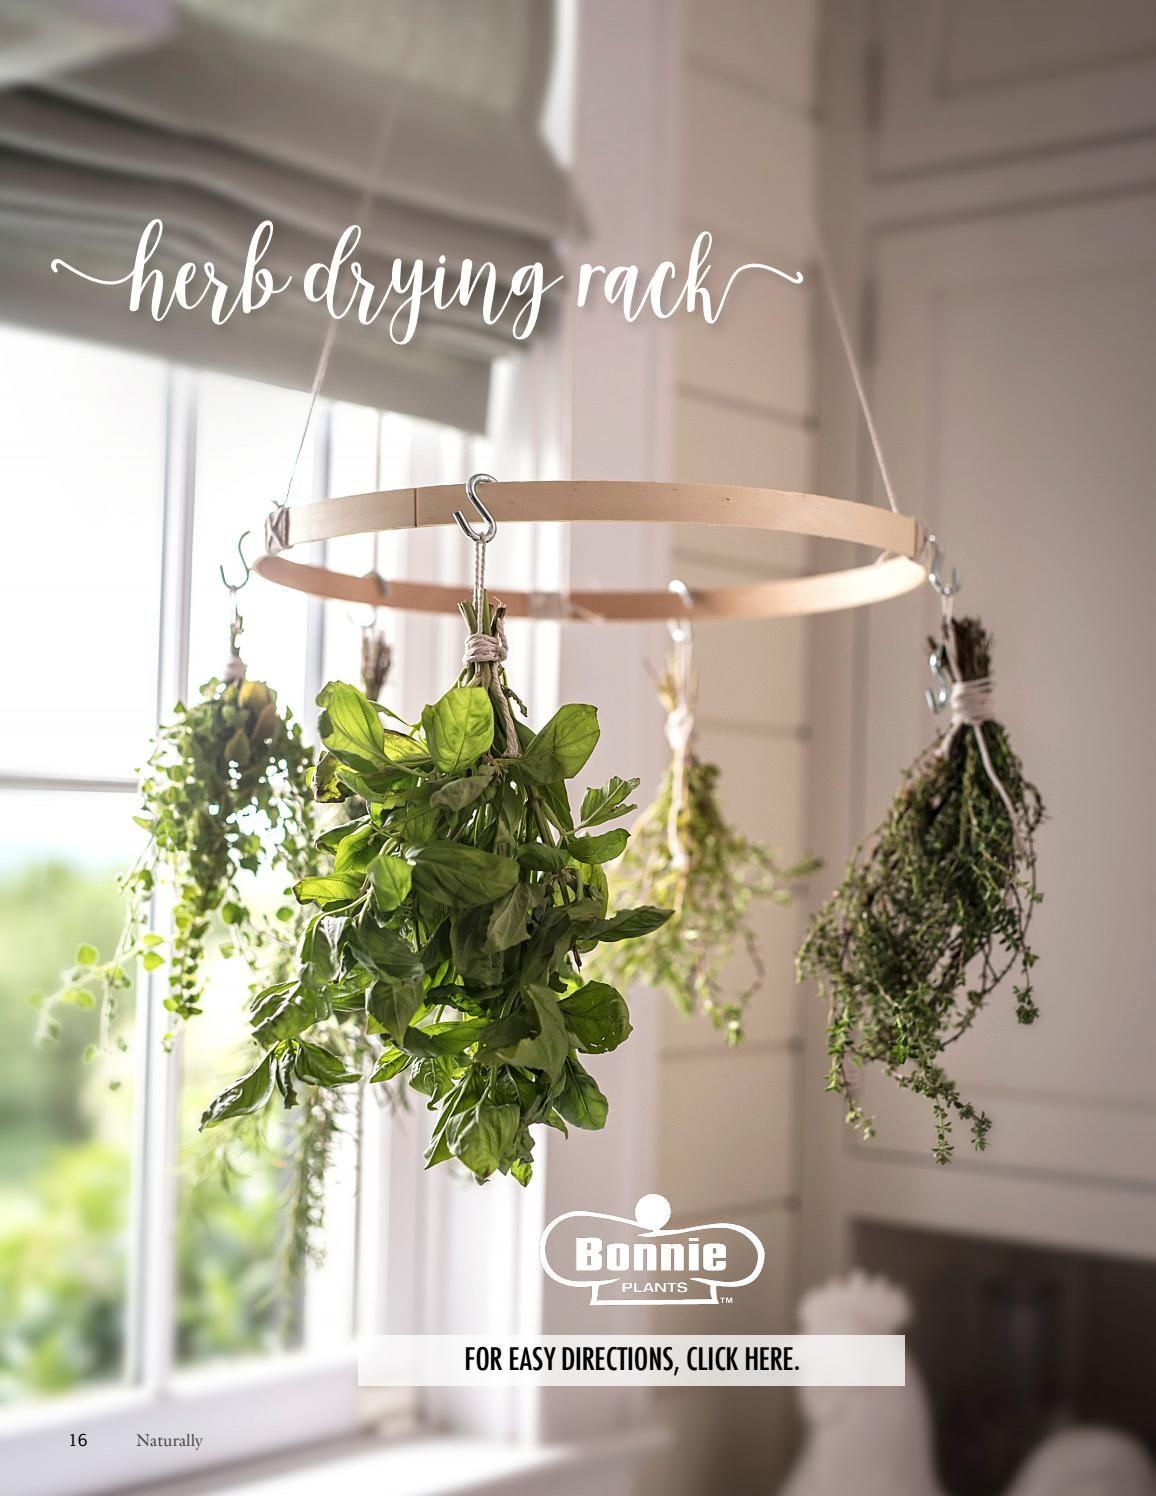 p allen smith naturally september 2016 herb drying racks drying herbs hanging herbs pinterest